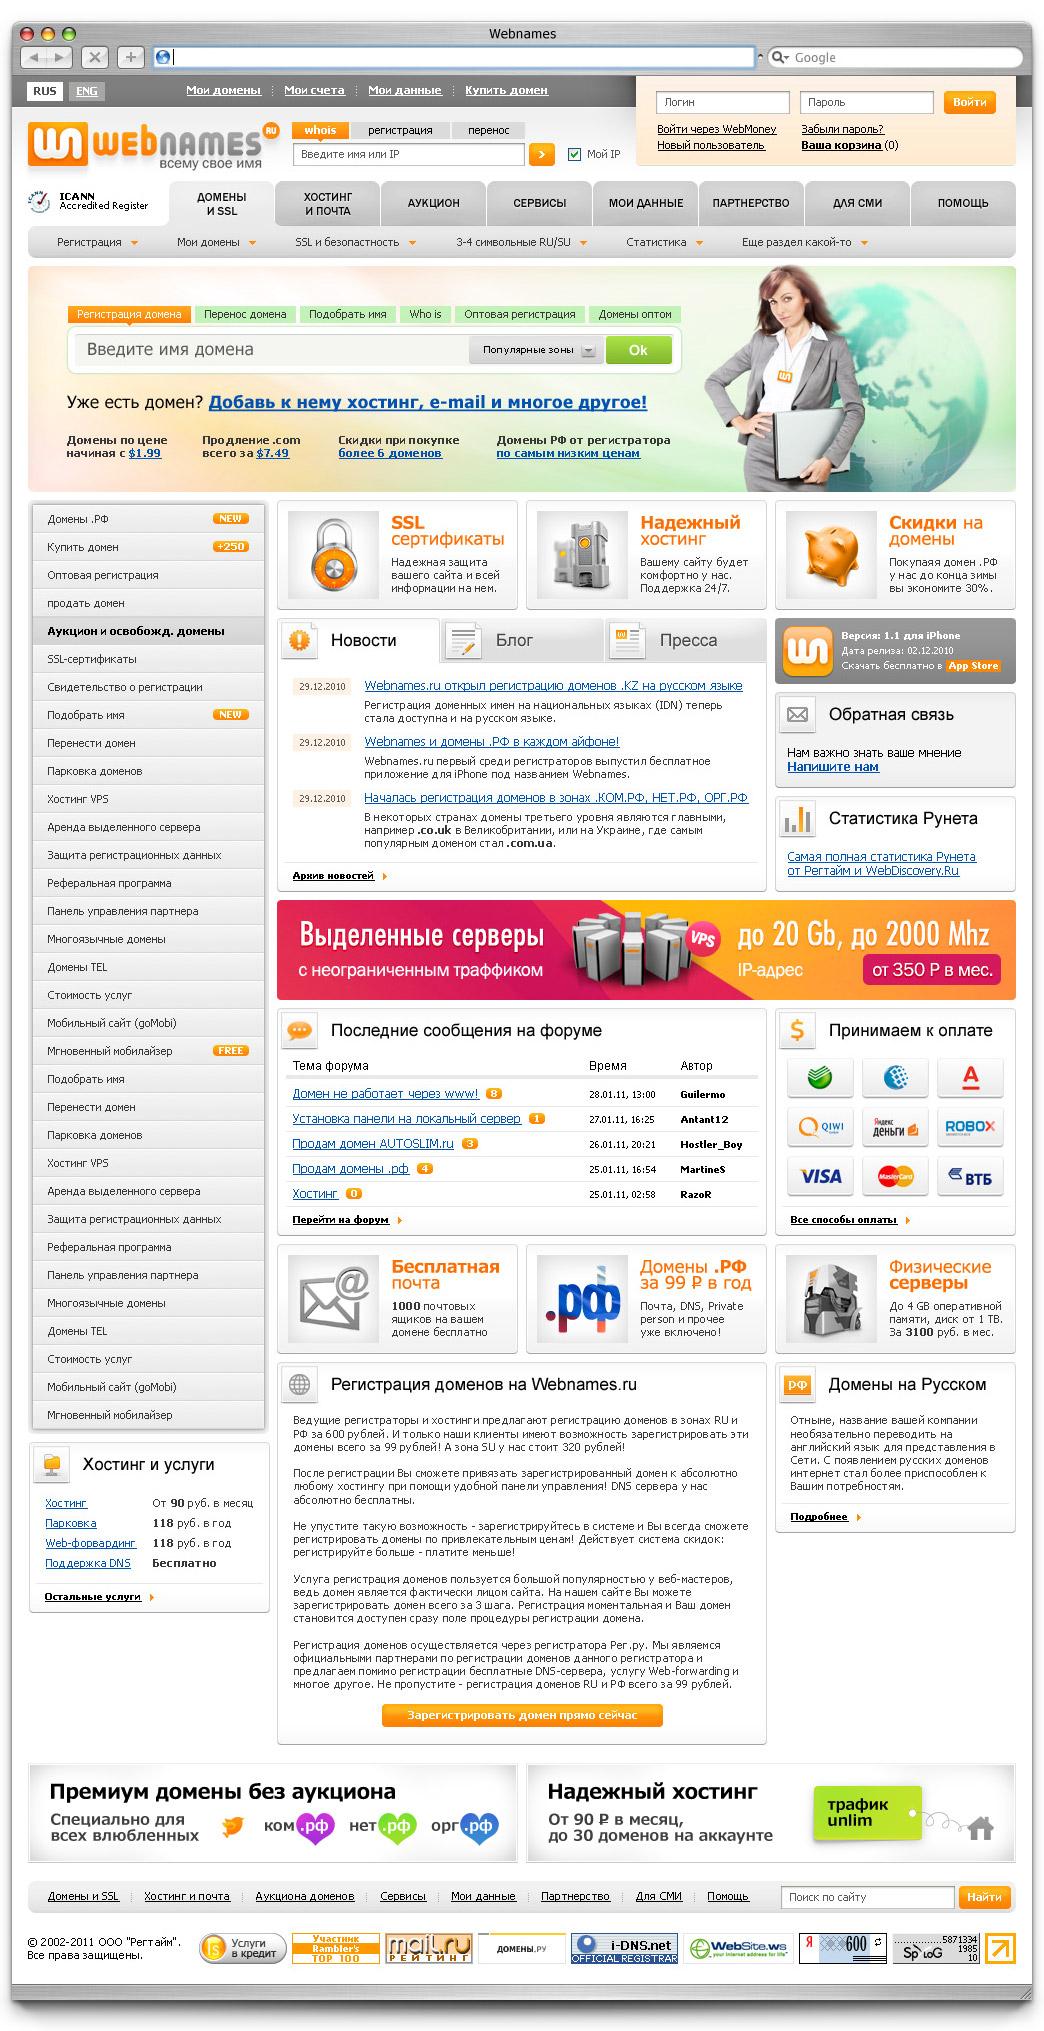 WebNames - версия дизайна